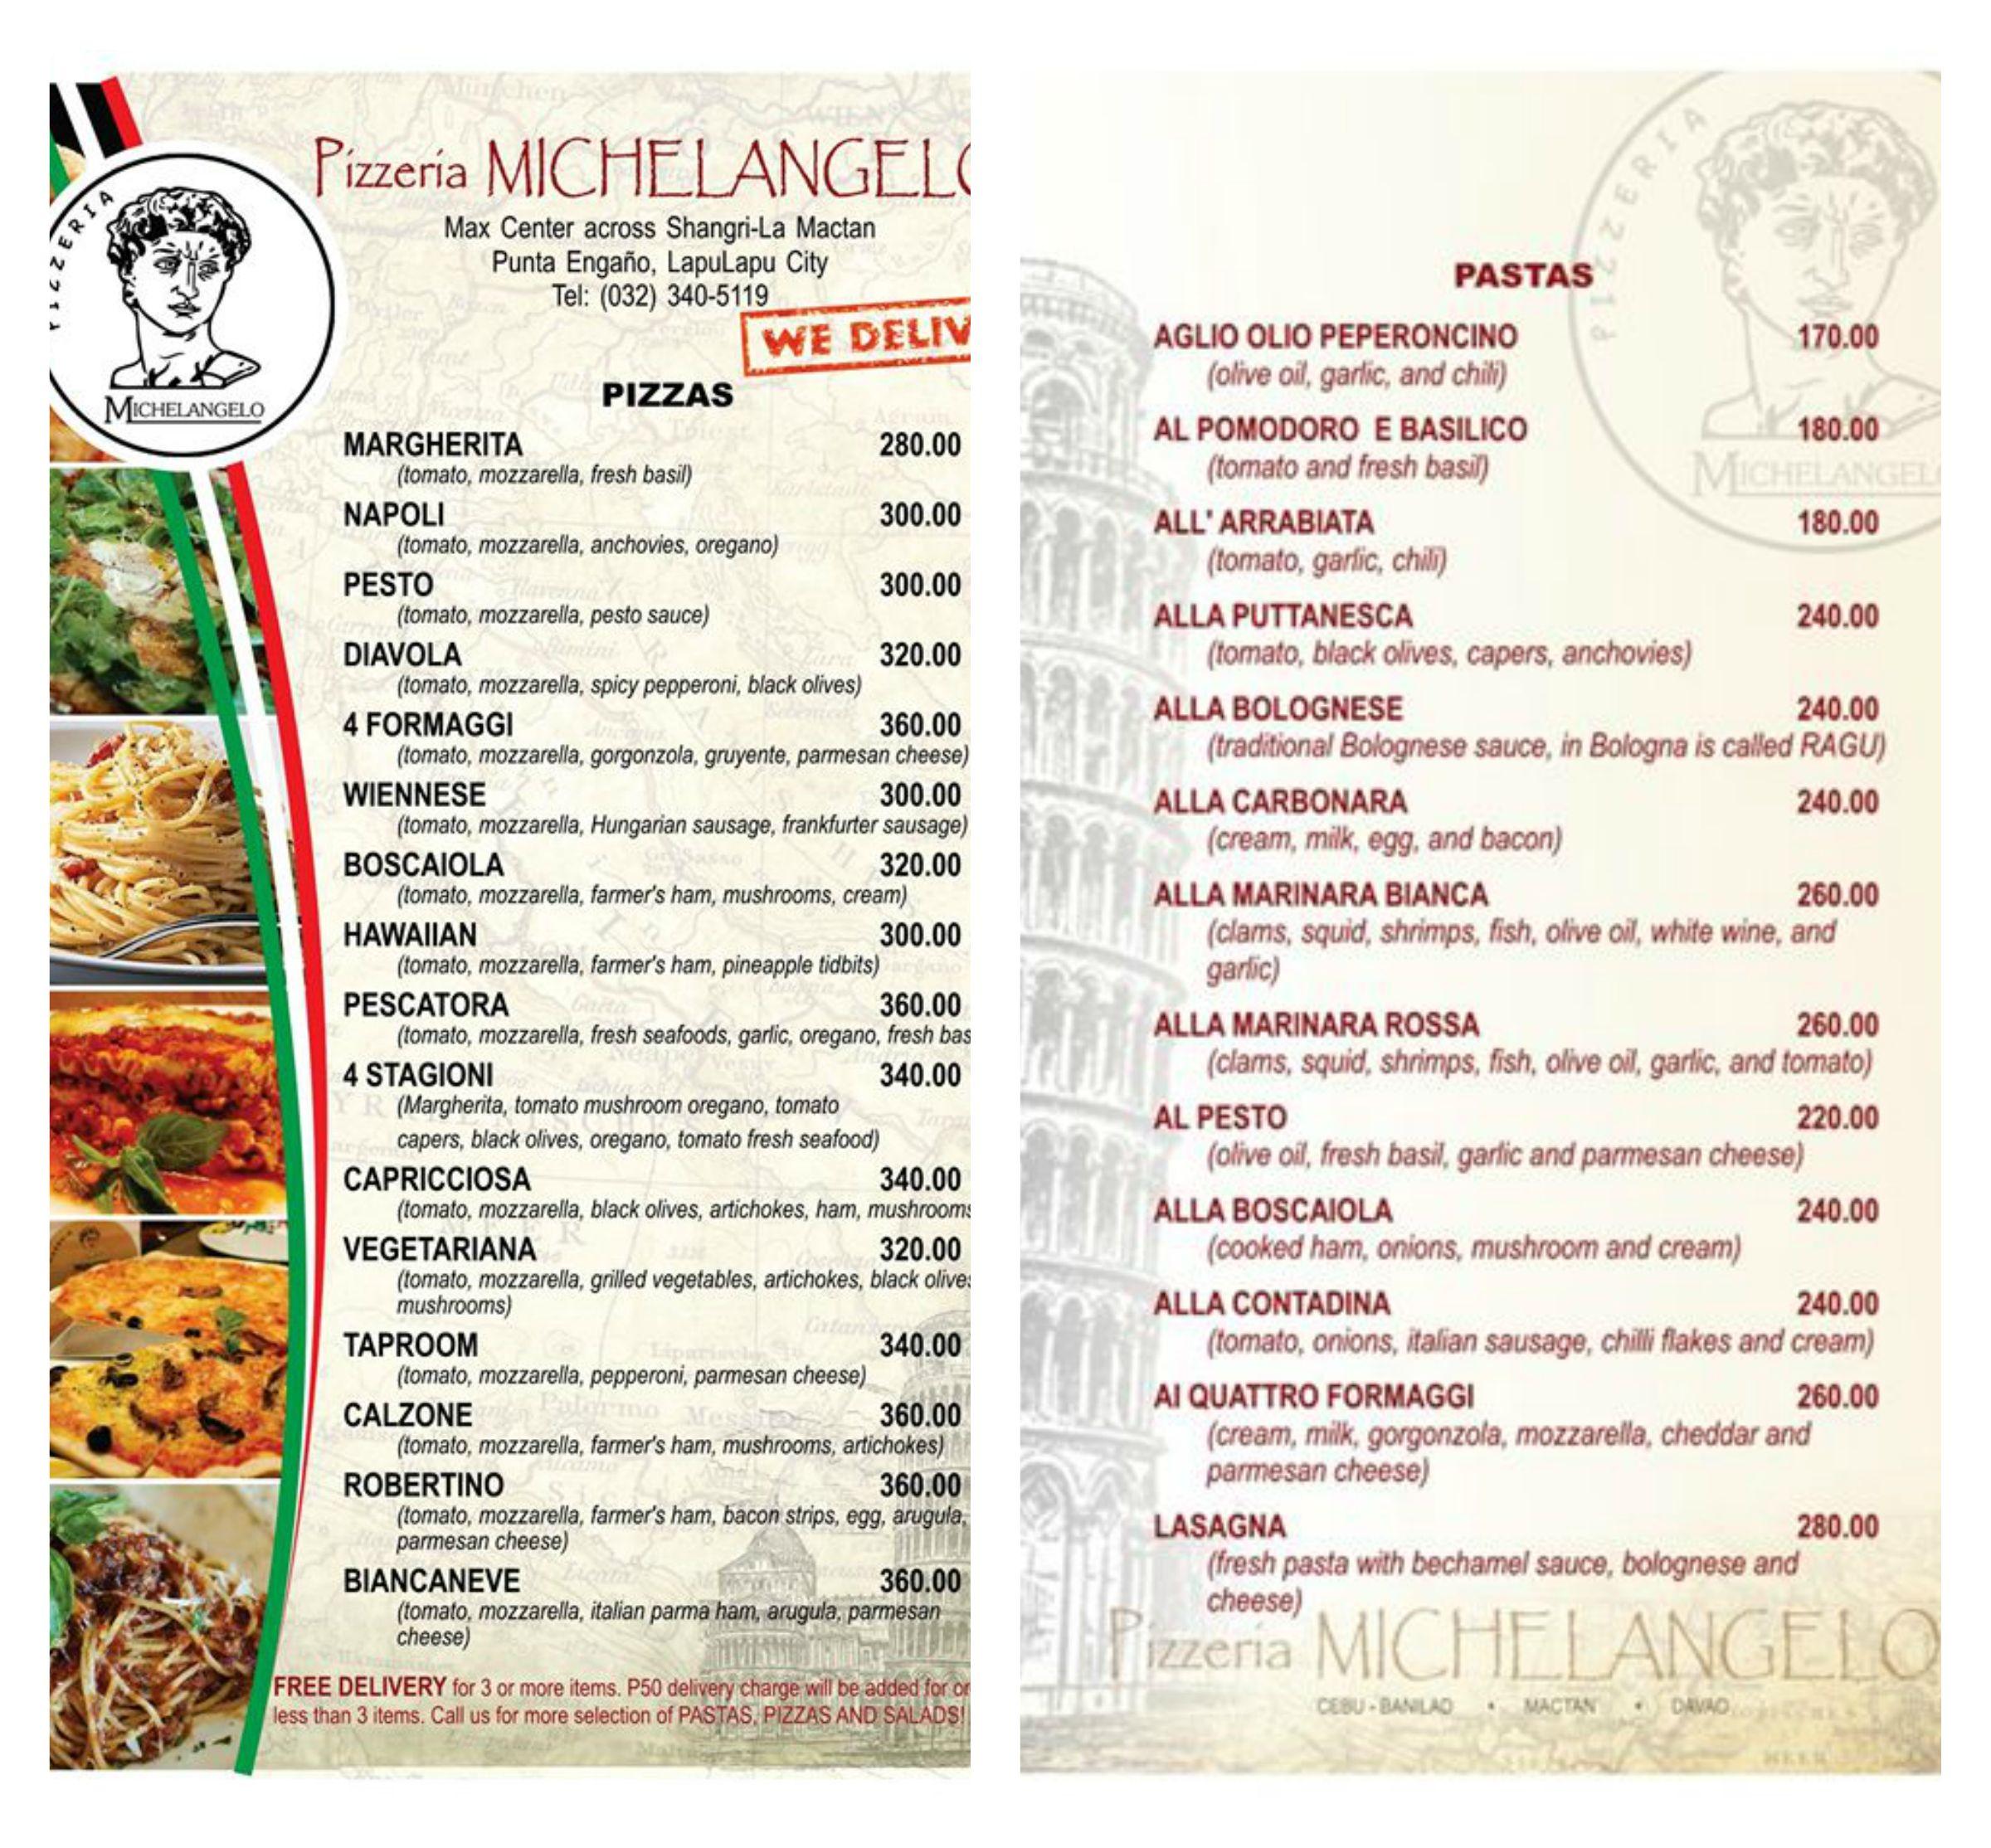 Pizzeria Michelangelo's Menu